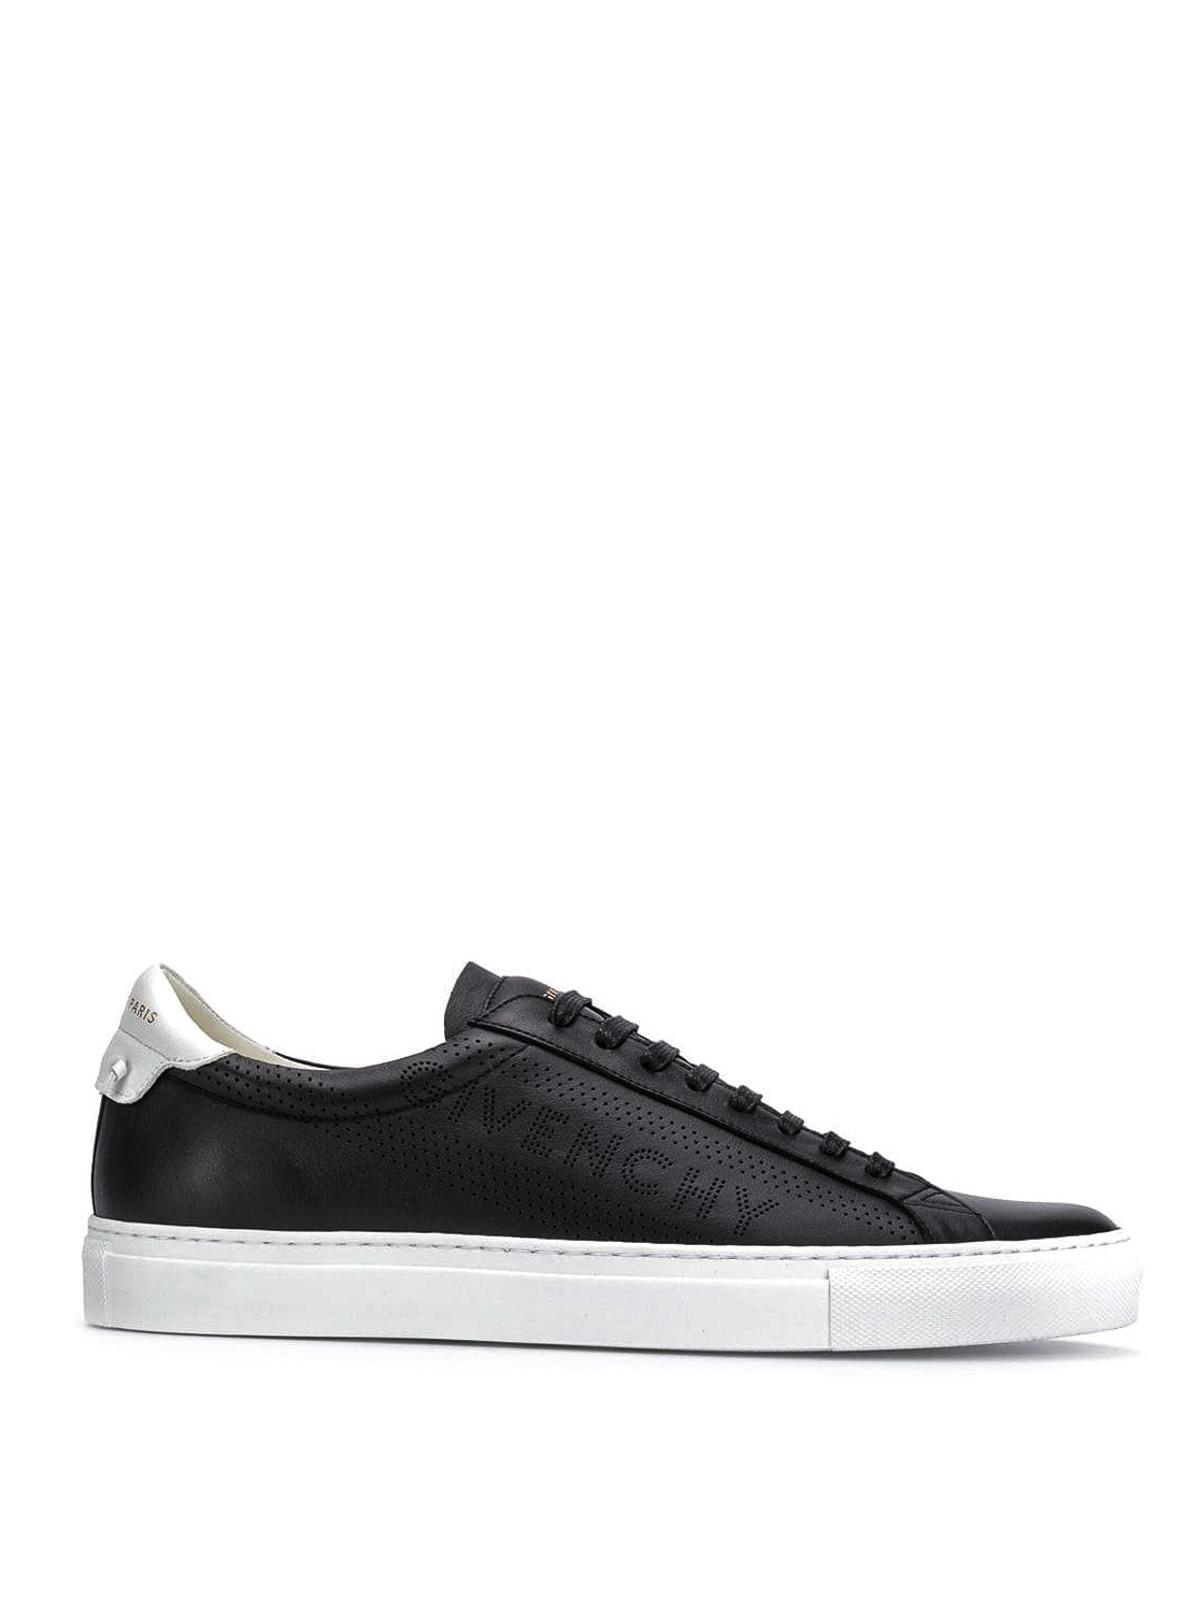 db90626a9033c Givenchy - Urban Street black sneakers - trainers - BH001PH0B2 004